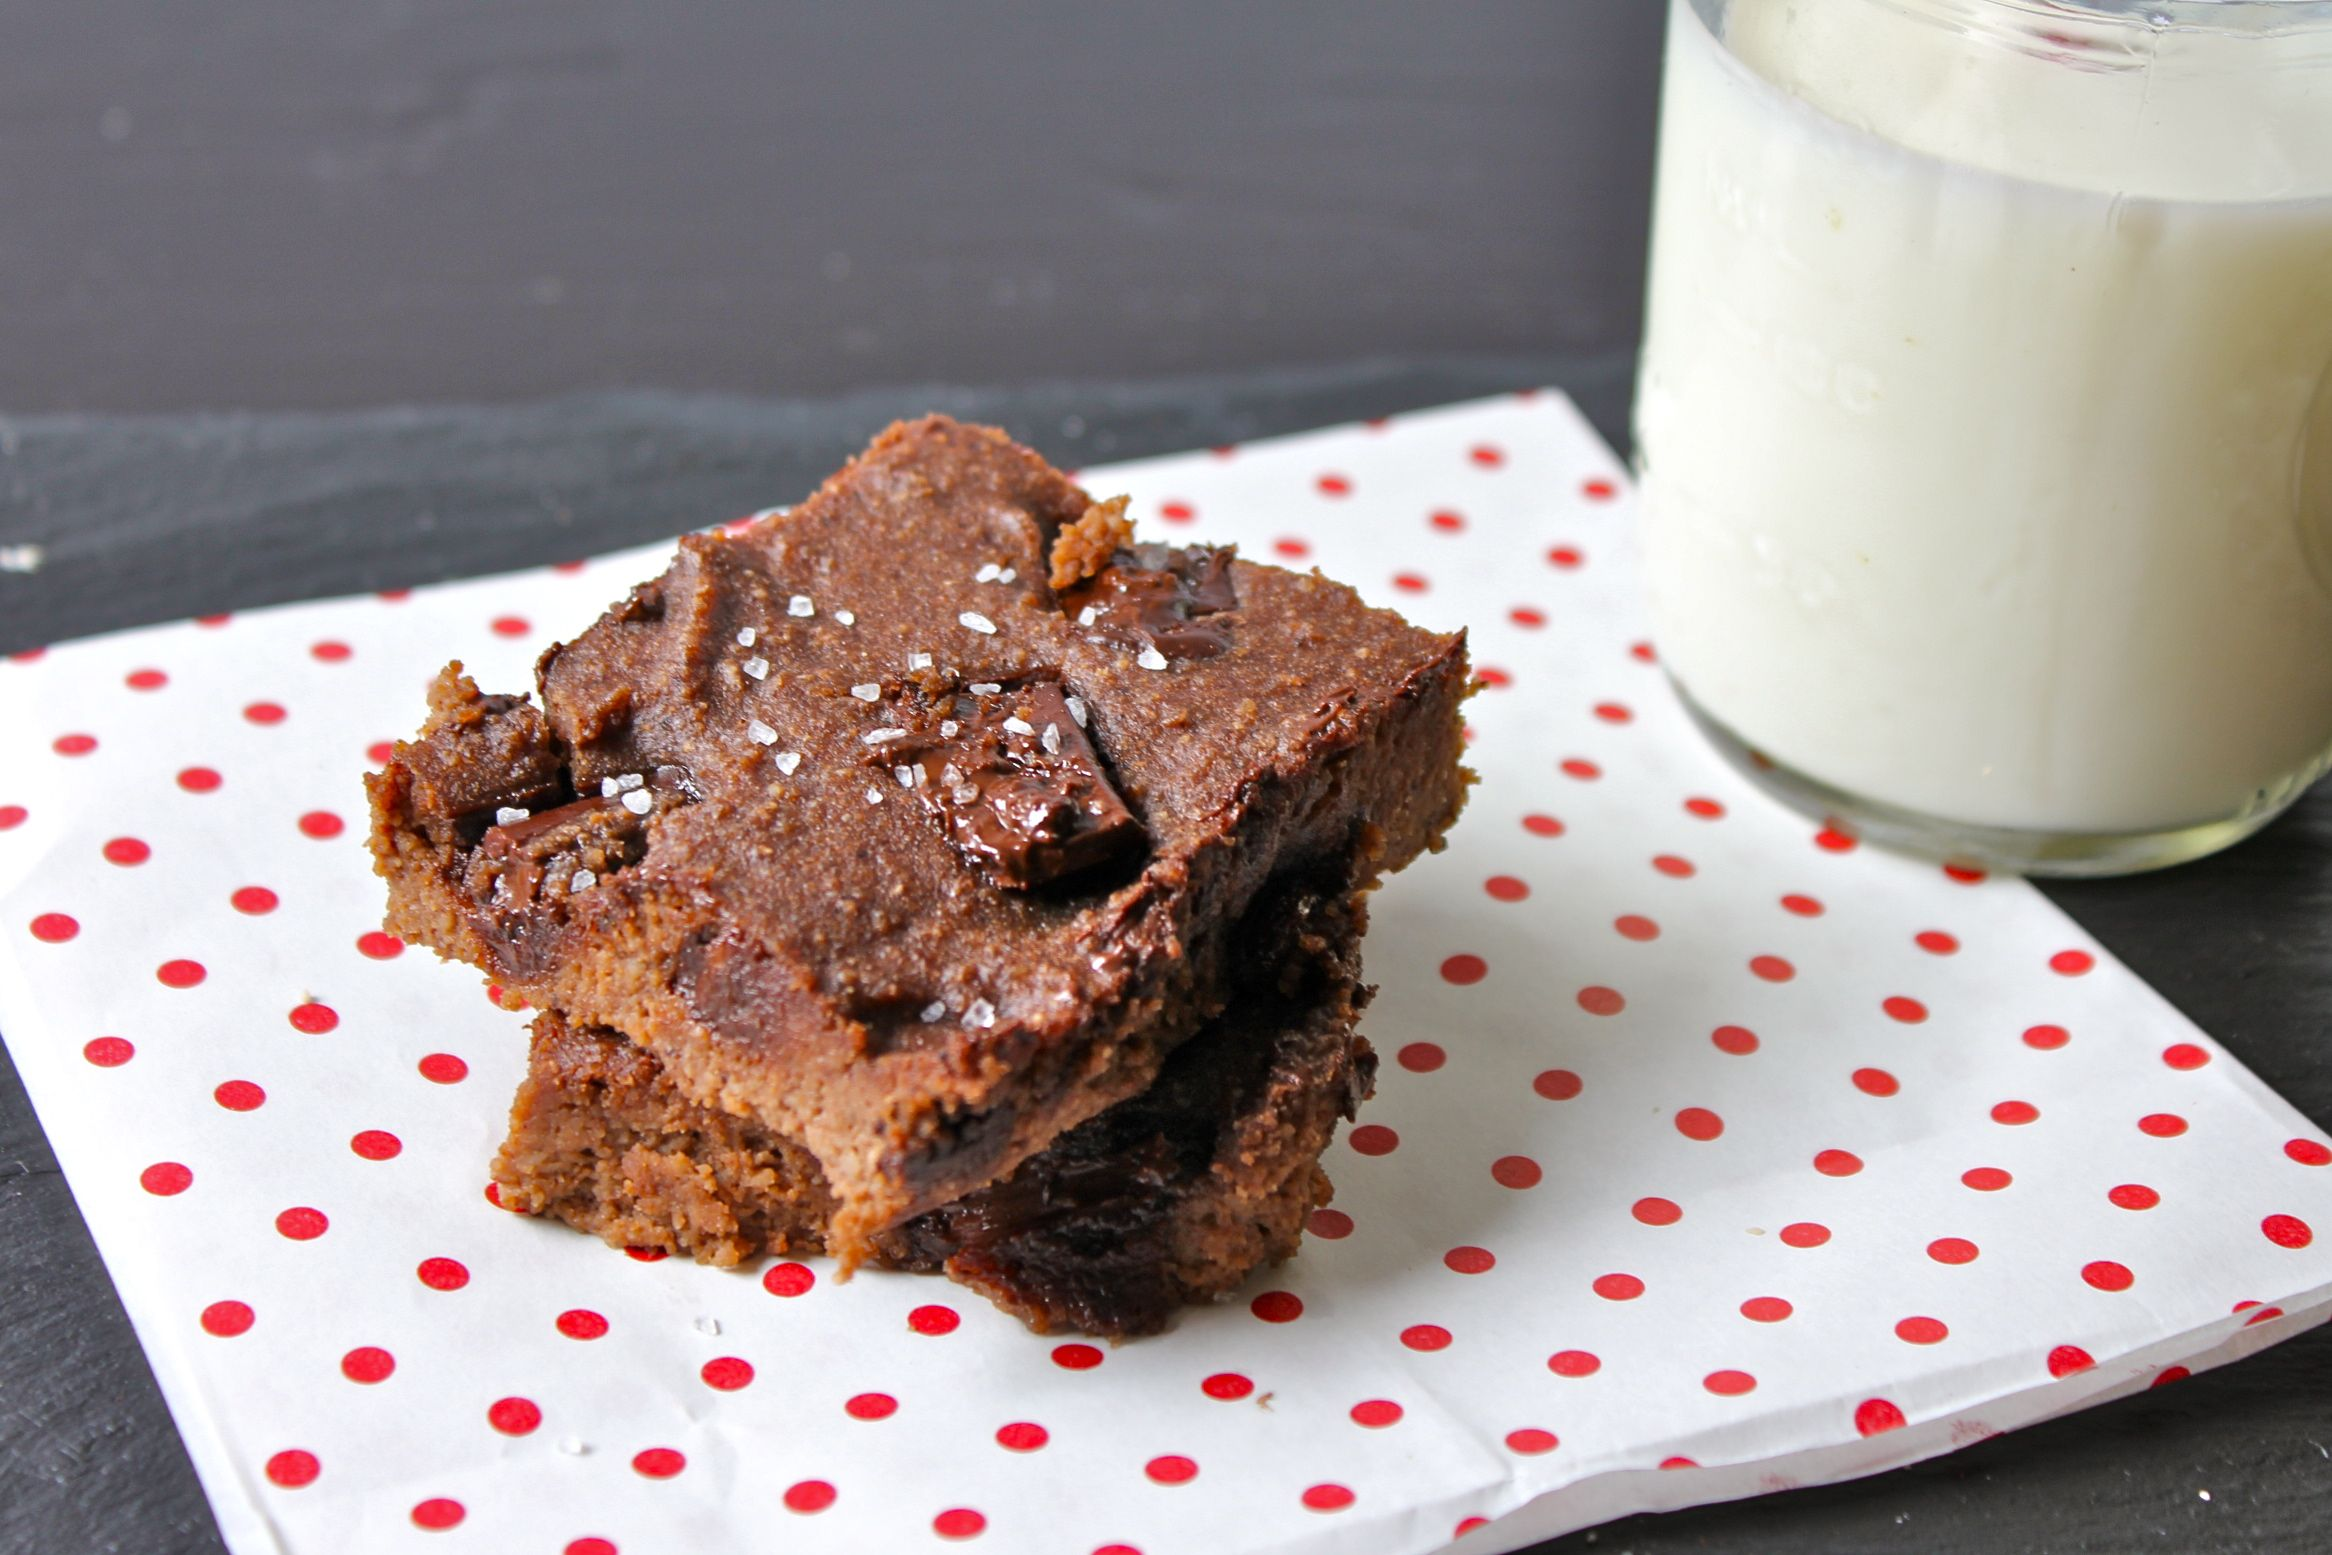 4 Ingredient Flour Less Chocolate Chunk Nutella Brownies (Gluten Free, Paleo, Vegan Option, Refined Sugar Free) | Mangia Blog